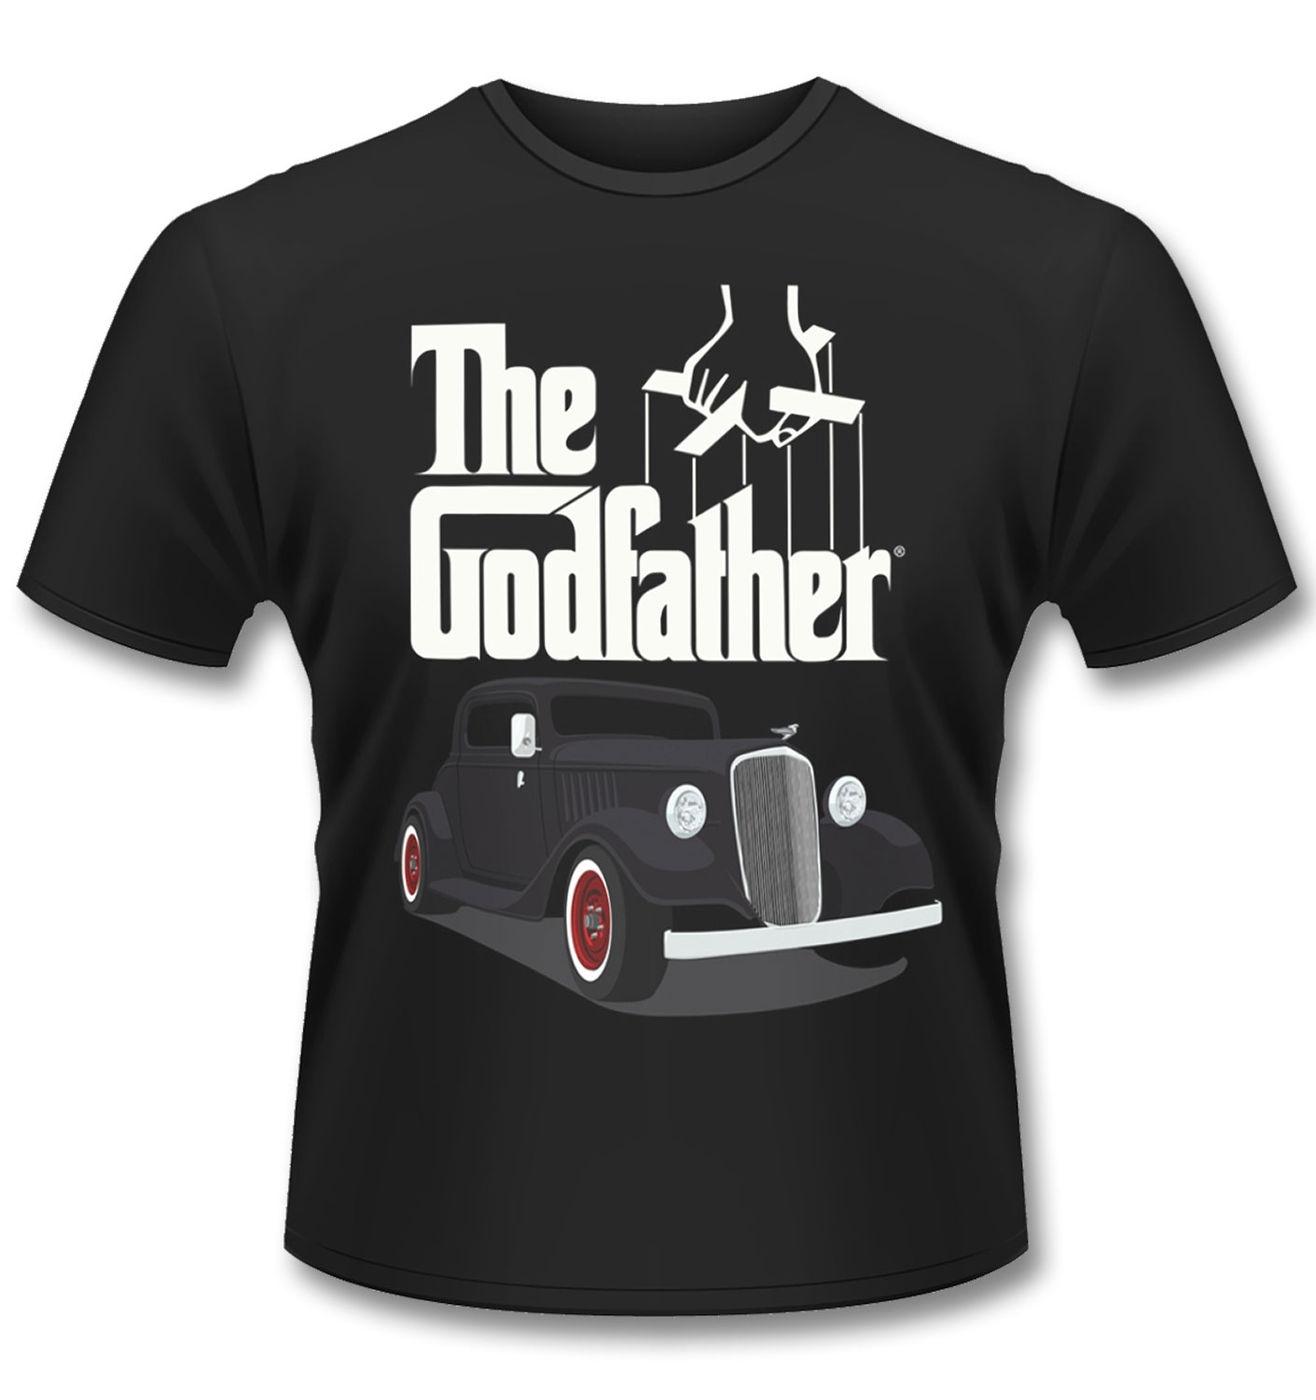 The Godfather Car t-shirt